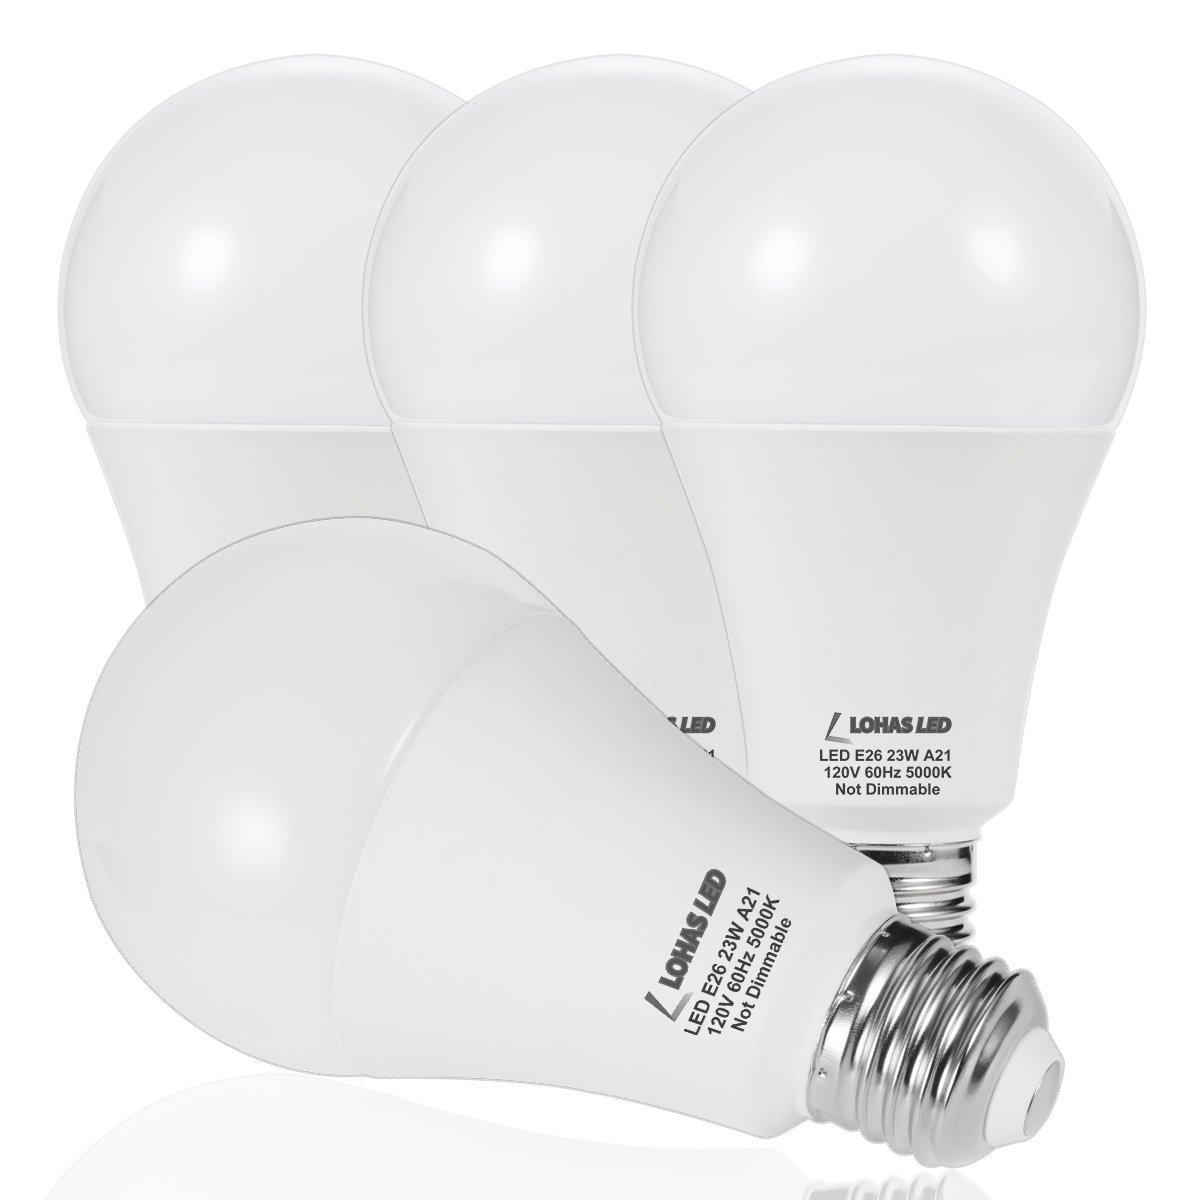 LOHAS Brightest LED Bulb